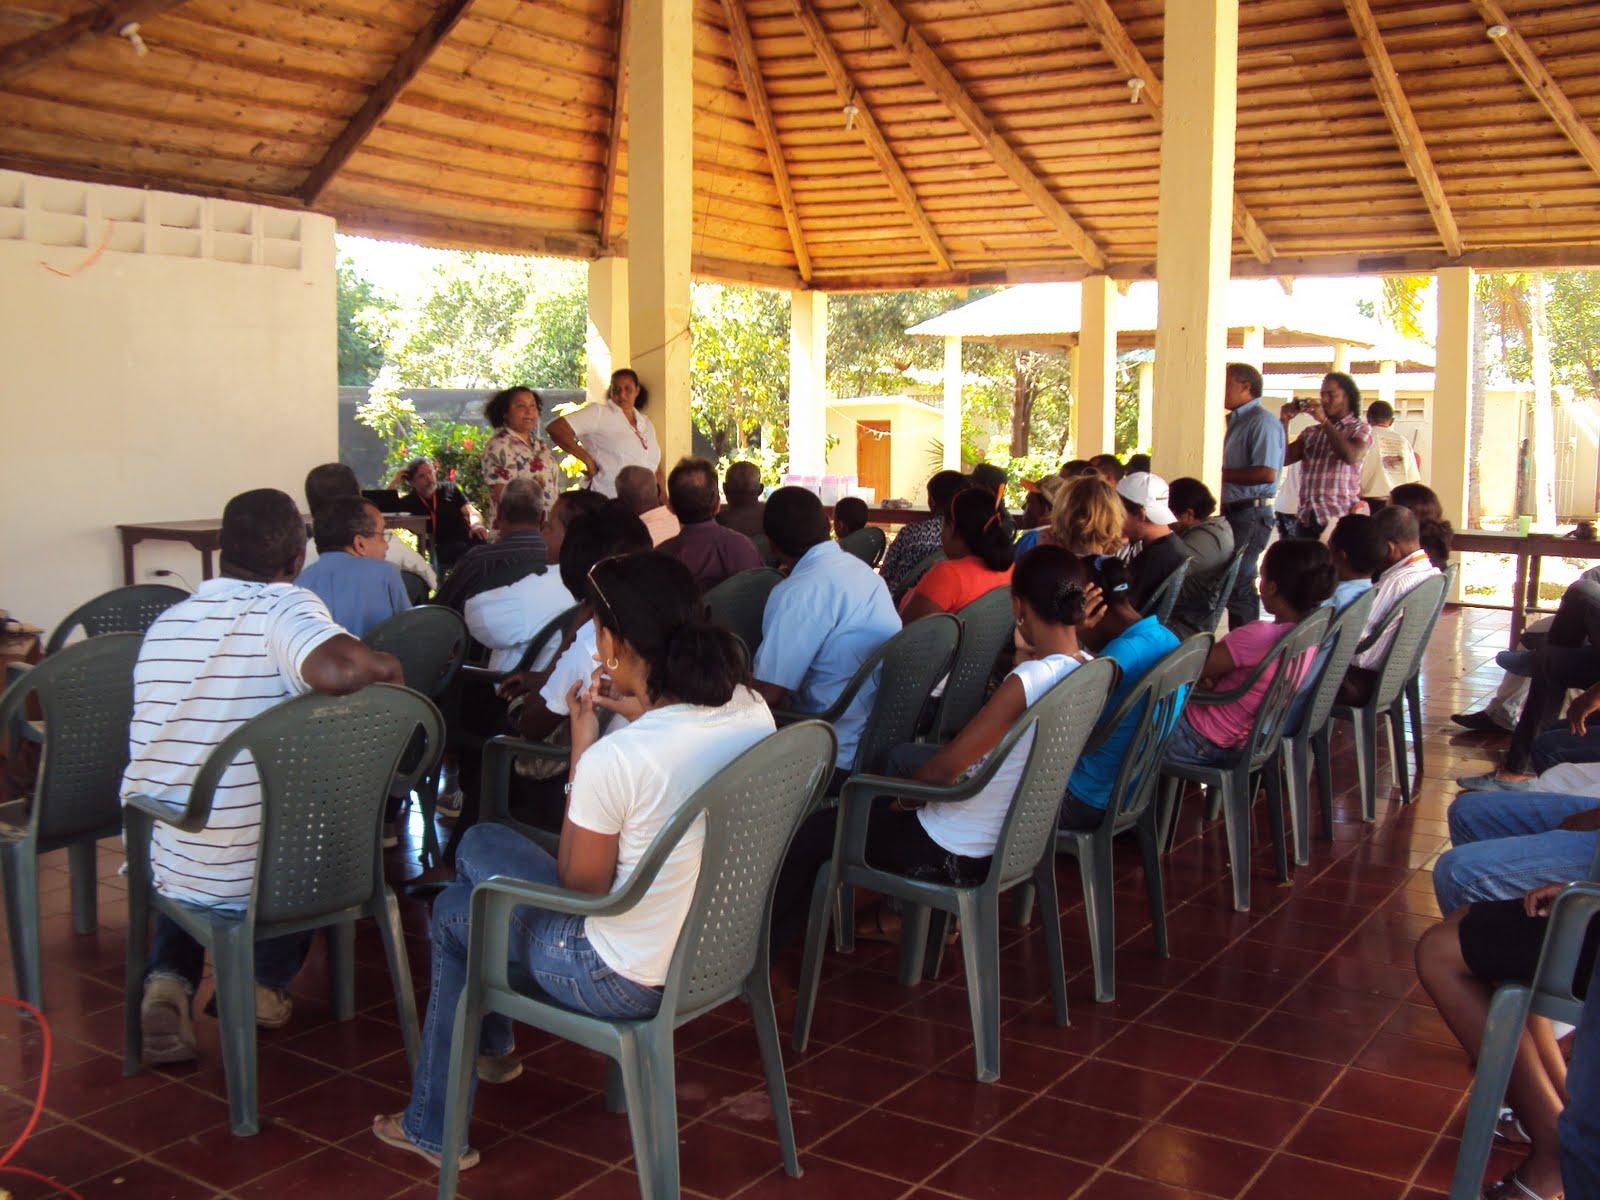 Jard n bot nico y el grupo jaragua clausuraron taller for Talleres jardin botanico